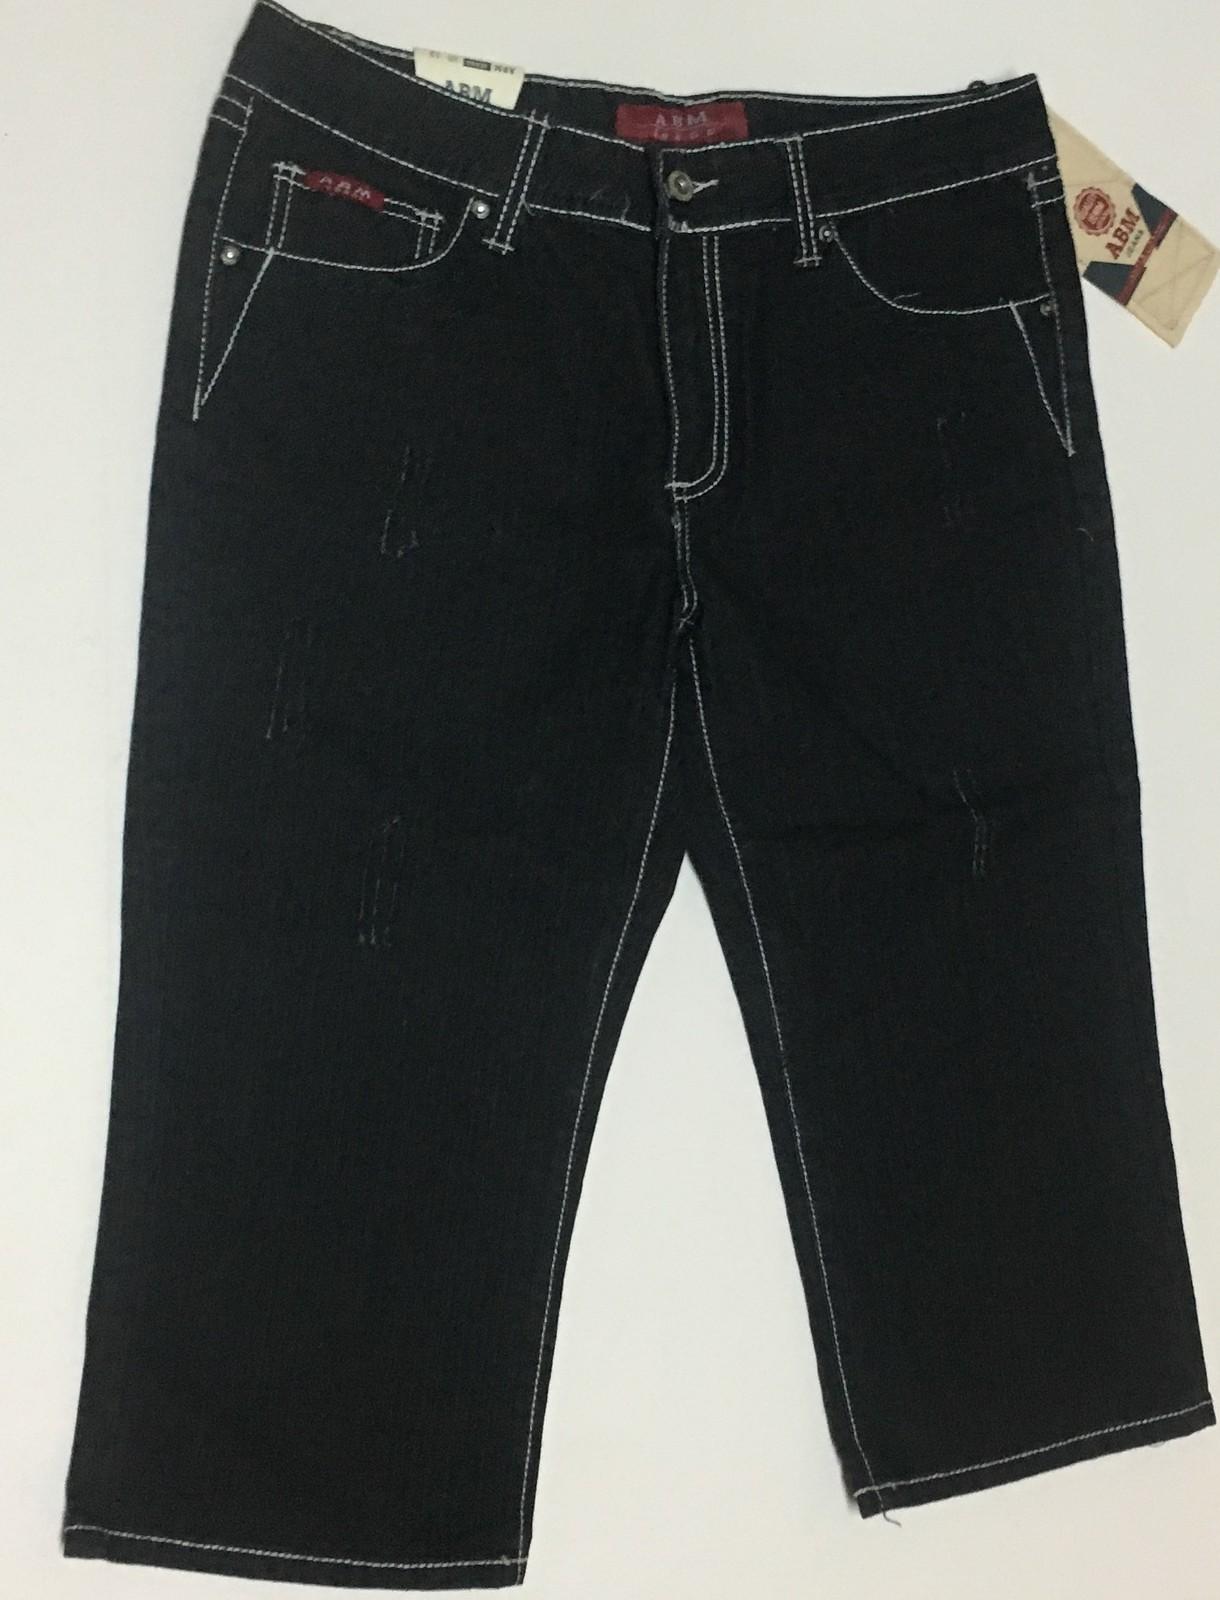 Women's ABM Jeans Capri Junior Sz 13 NWT Black w/White Trim